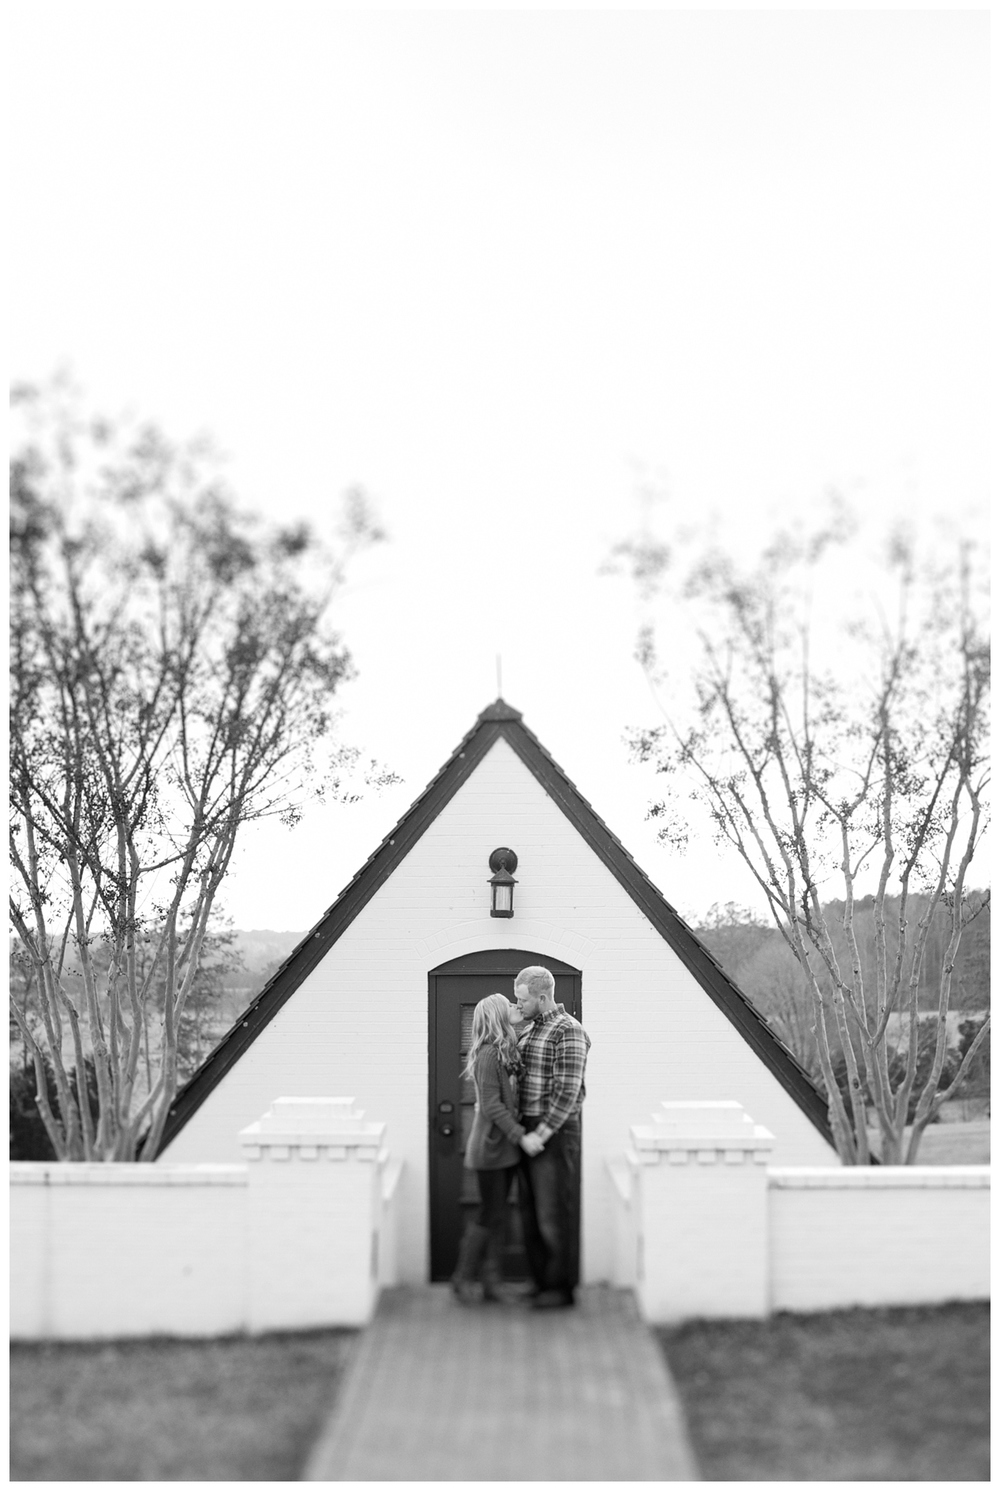 Bloom&Lo_AtlantaPhotographer_AmeliaTatnall_2015_blog_Portfolio_Rome_Georgia_Engagments_BerryCollege_CampWinshape_Amanda&Lucas__0007.jpg